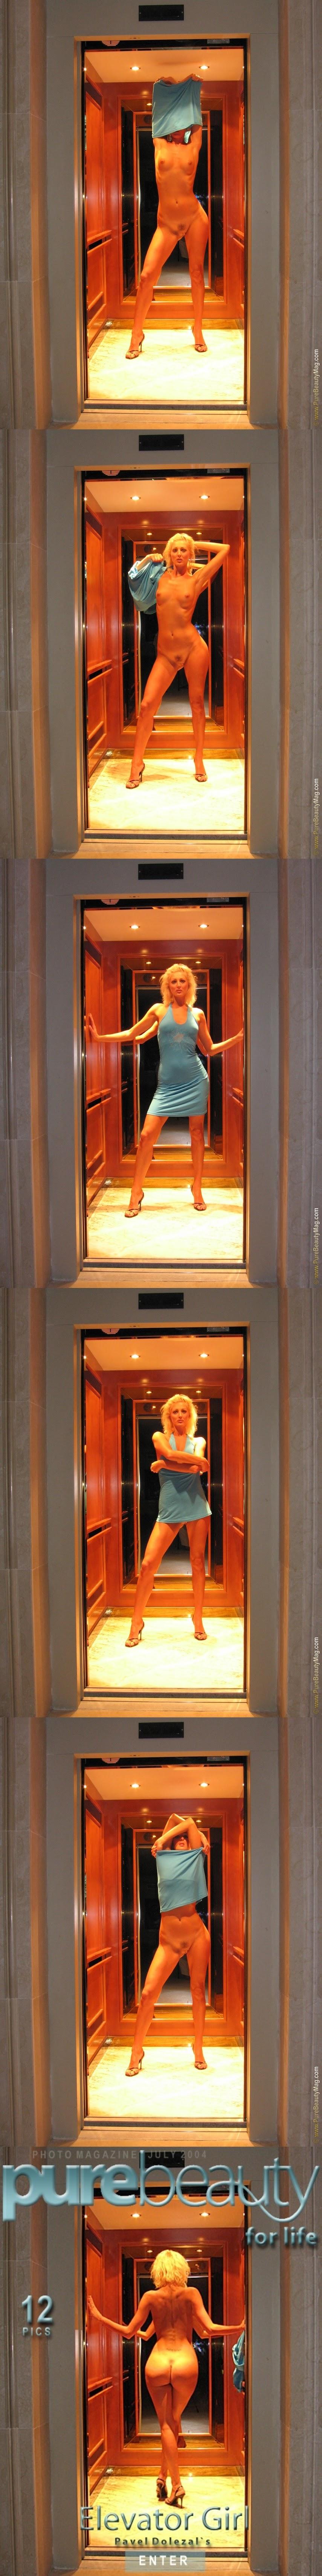 PureBeautyMag PBM  - 2004-06-29 -  s35931 - Vilma - Elevator Girl - 3072px - idols